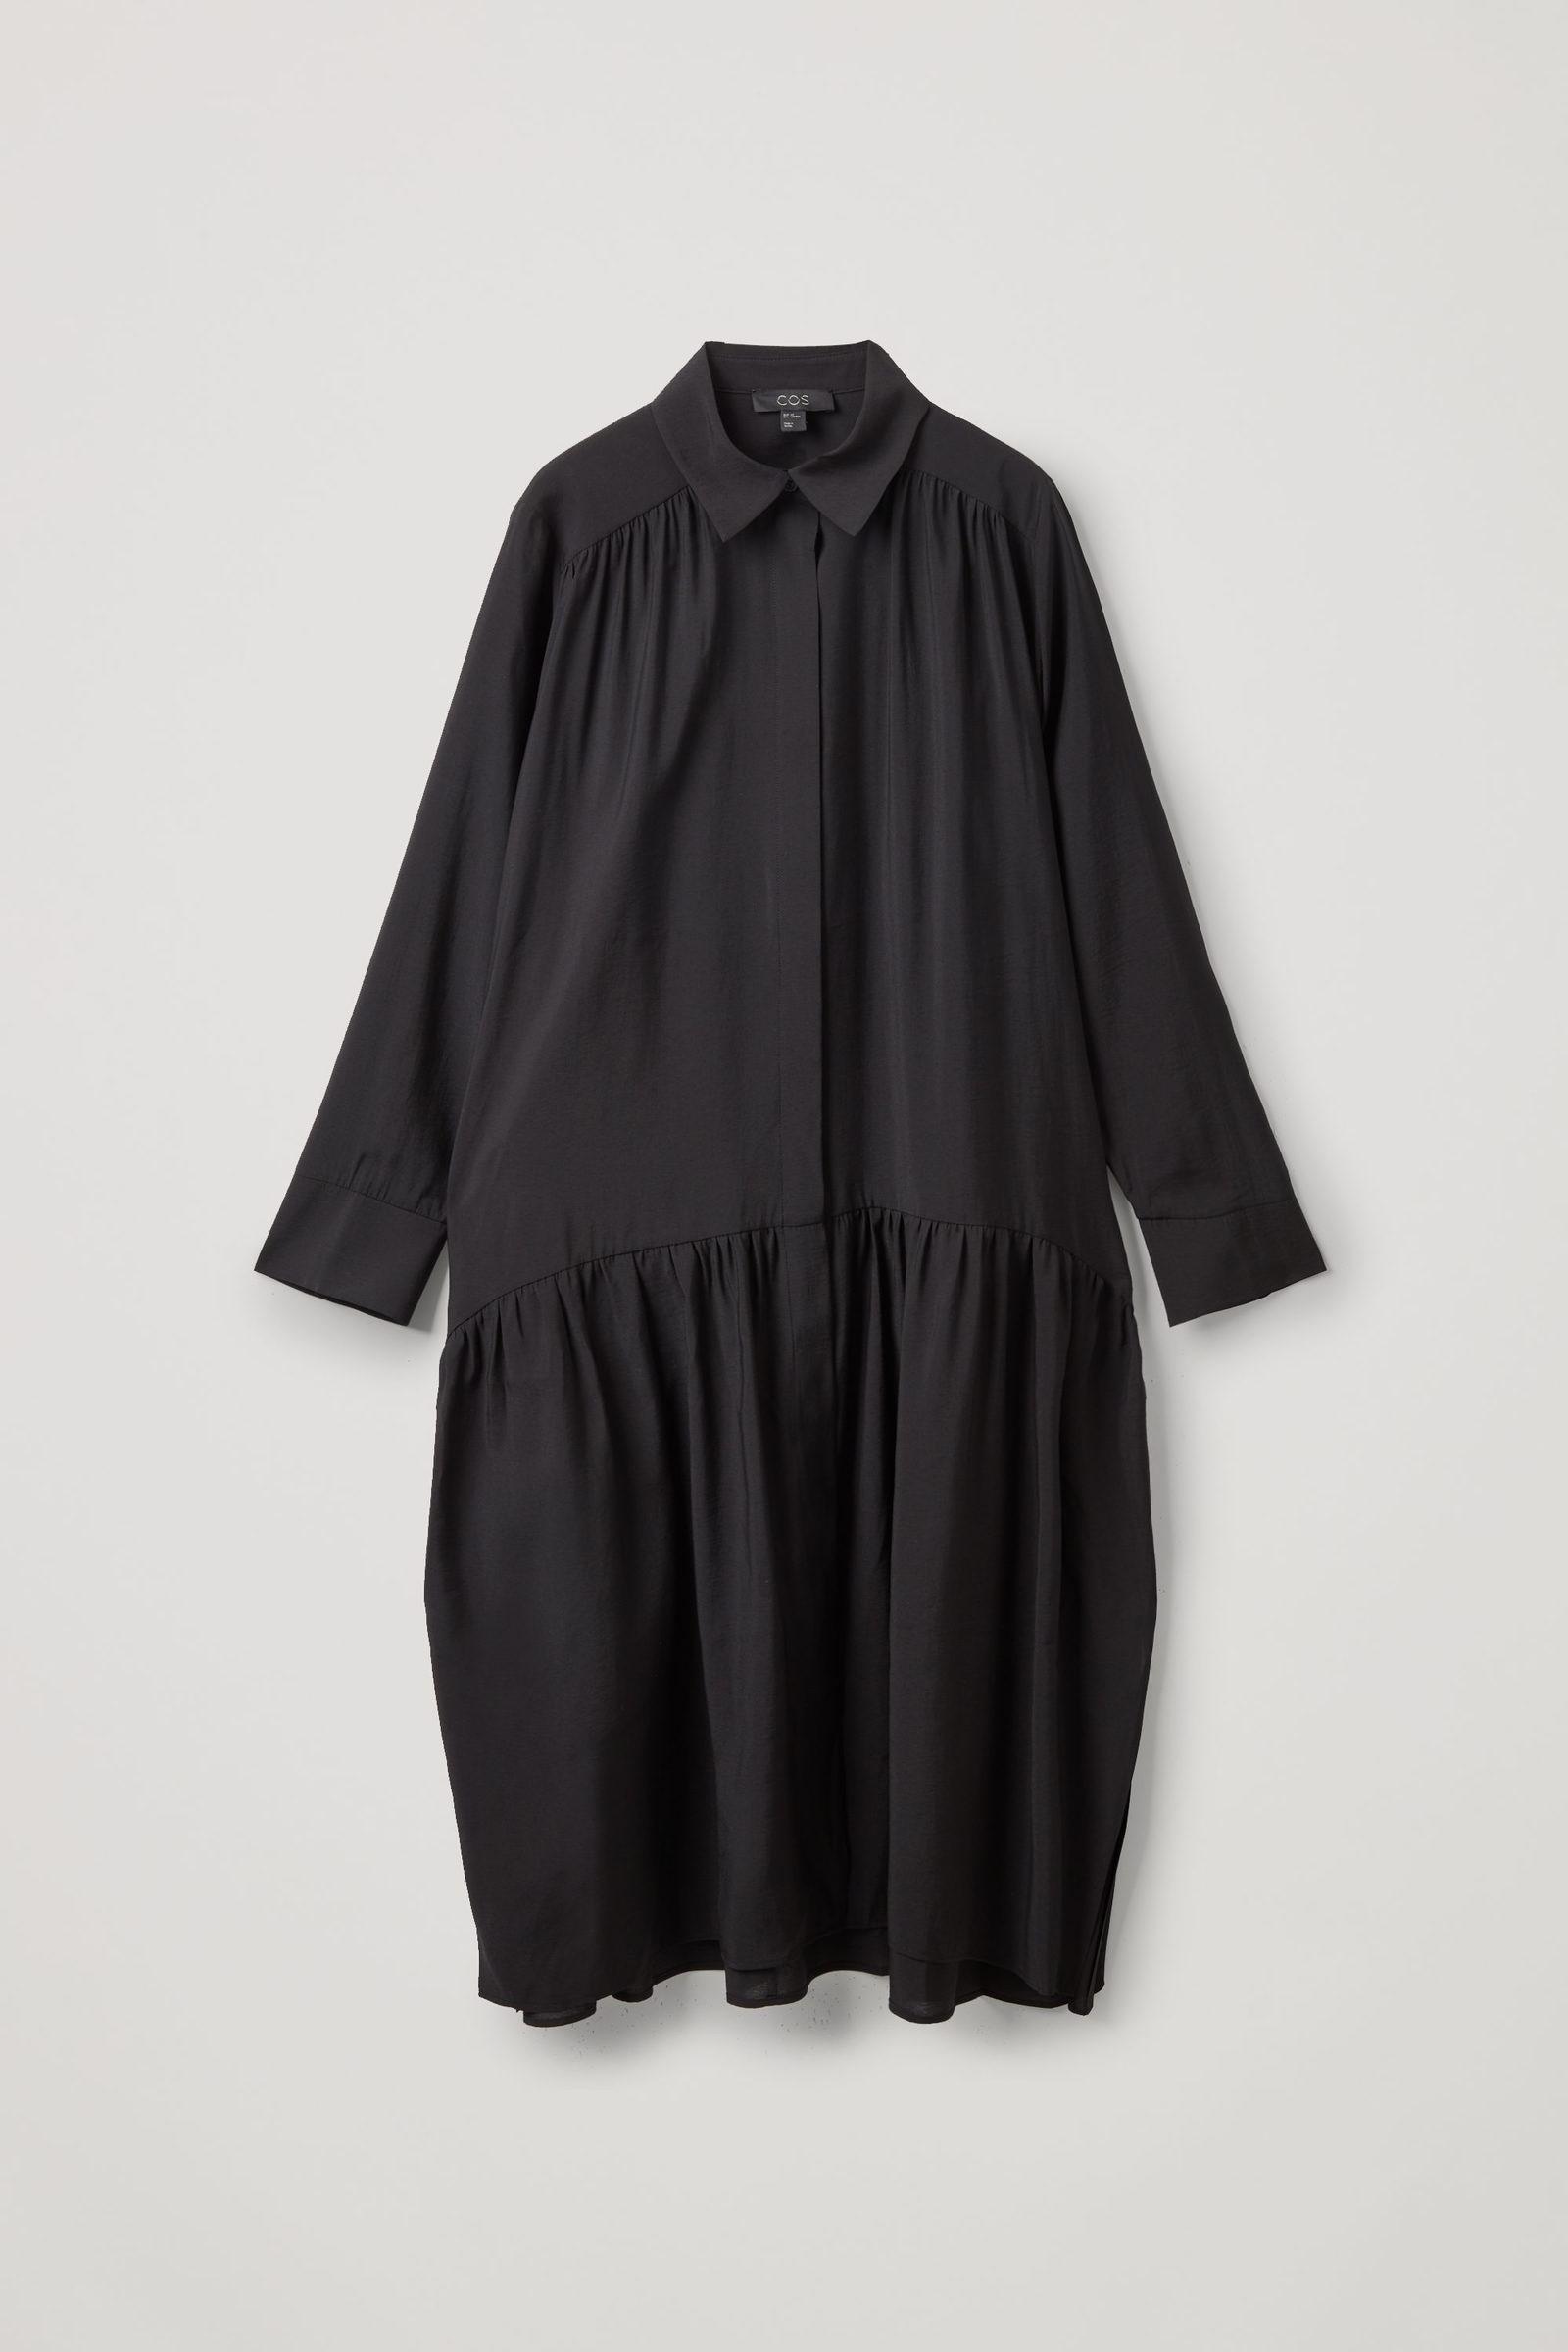 COS 티어드 미디 셔츠 드레스의 블랙컬러 Product입니다.